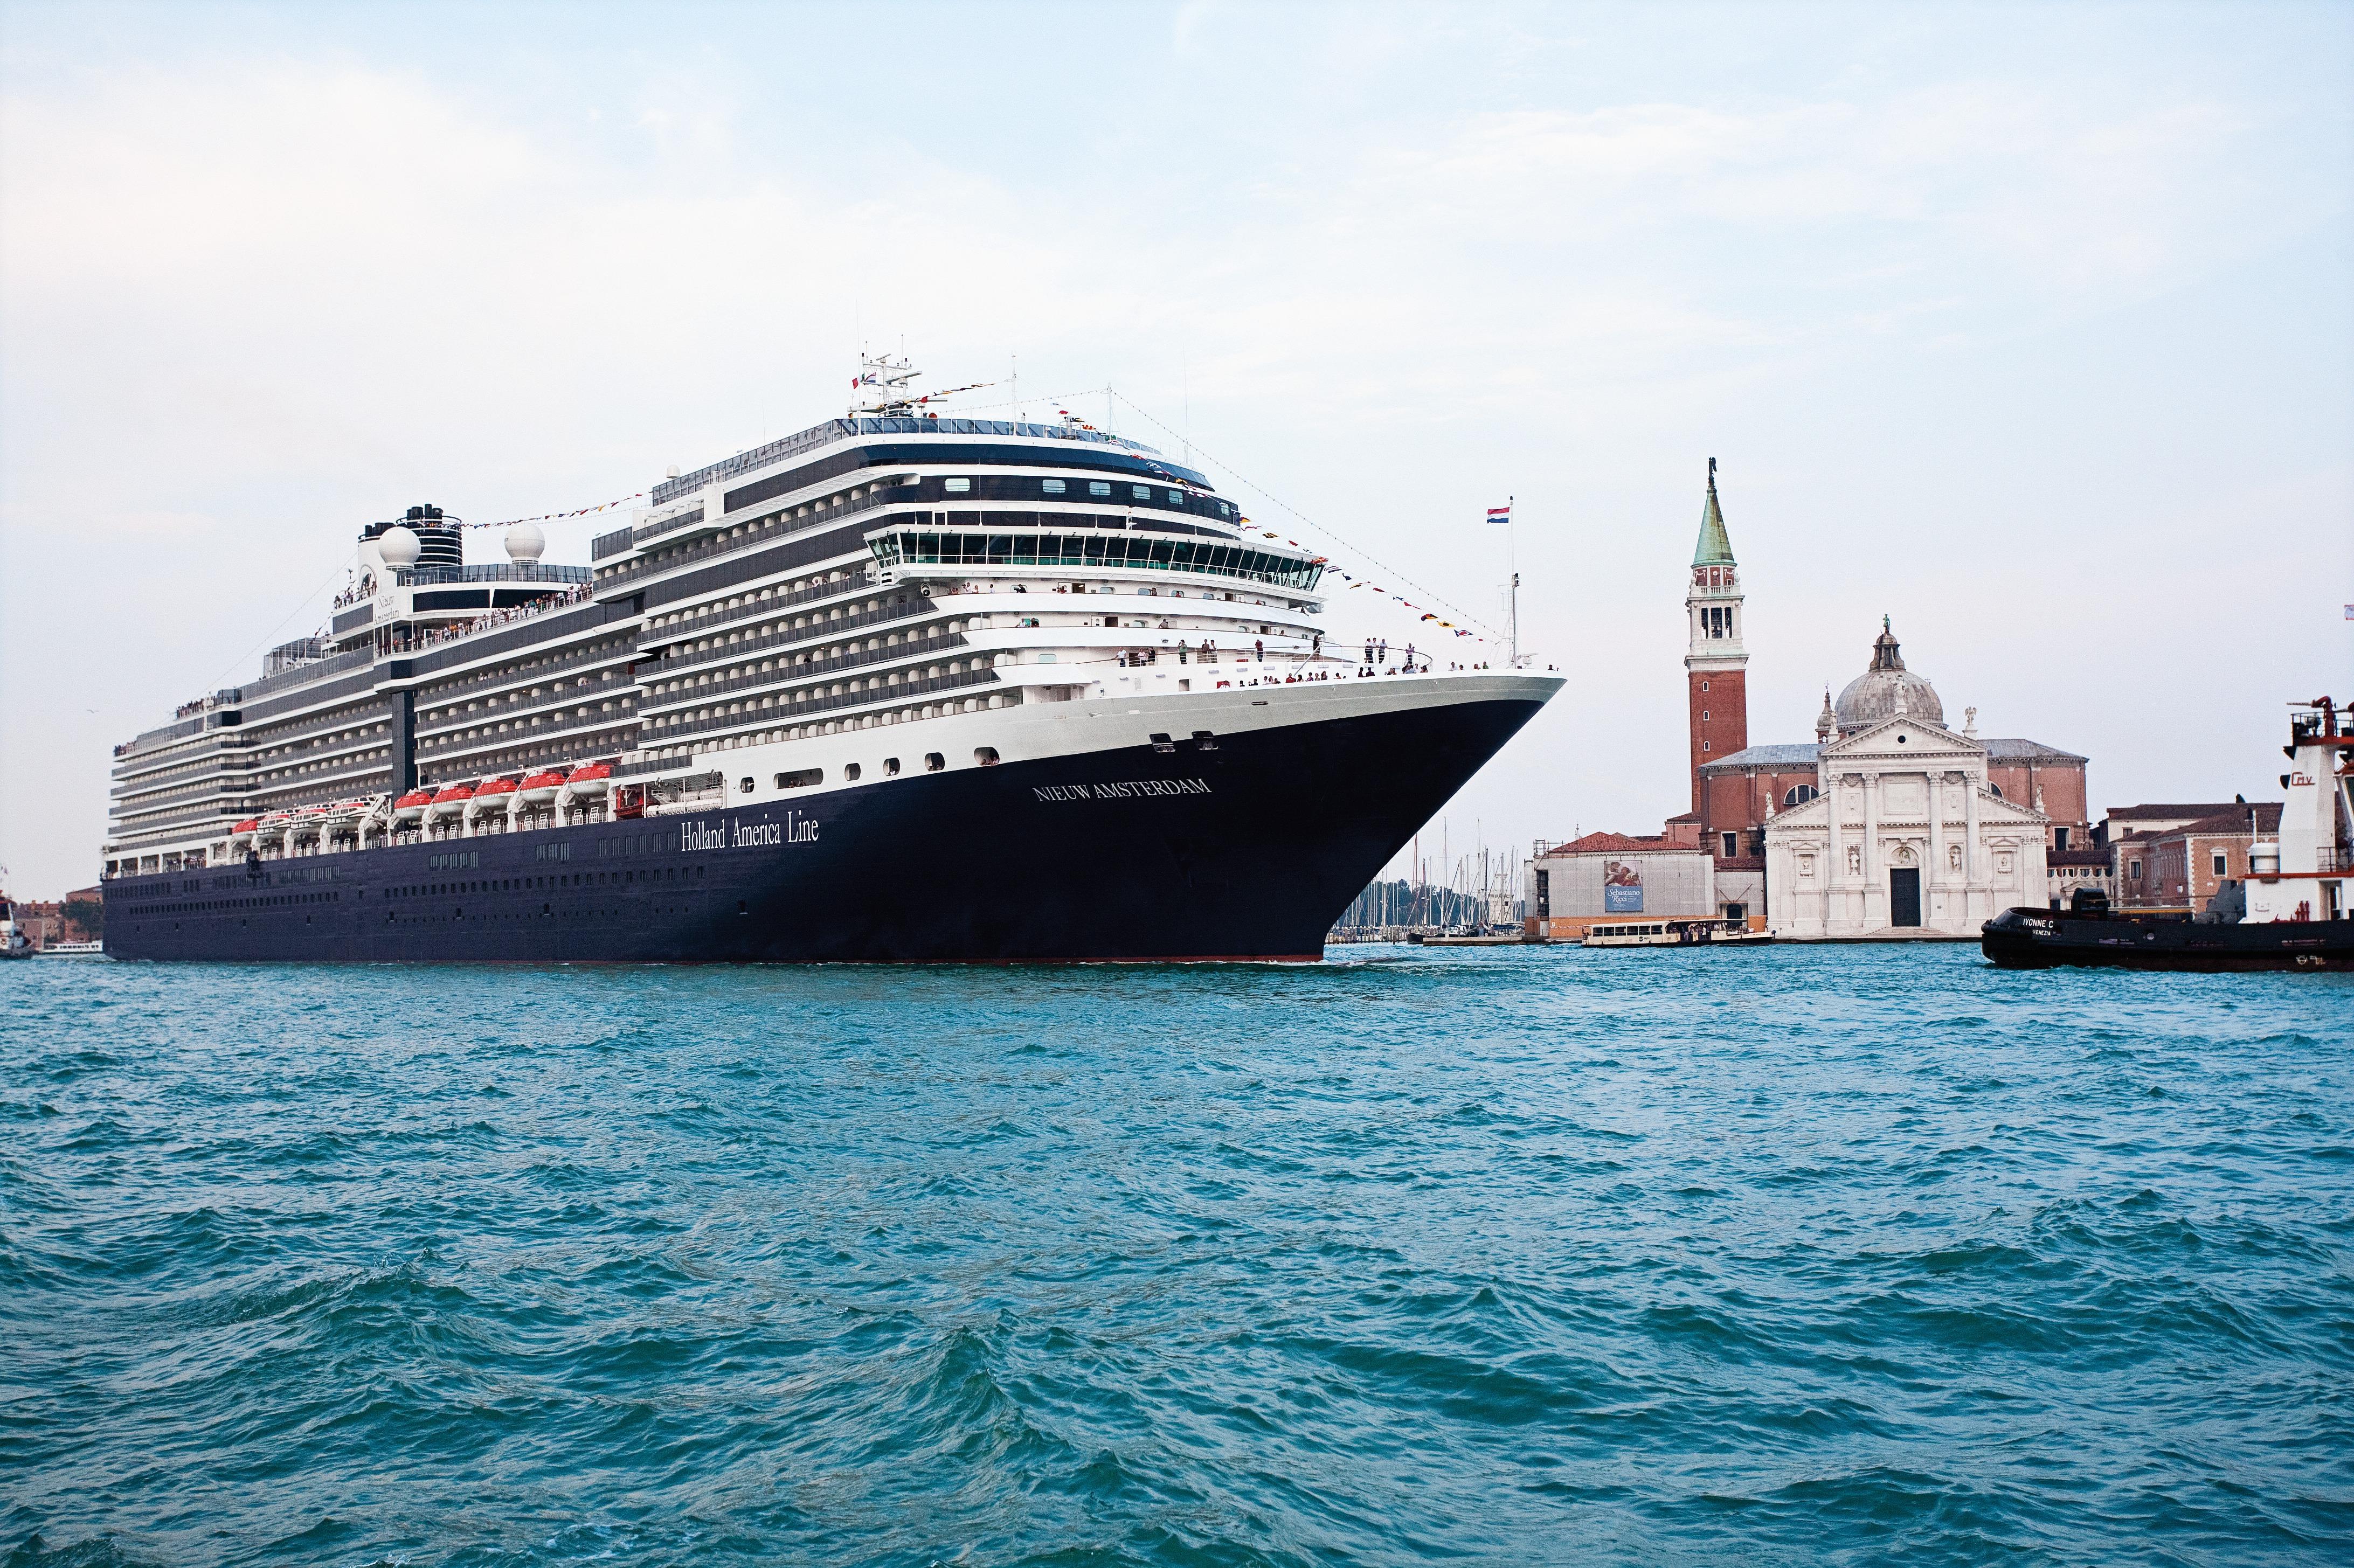 Holland America Line cruises - MS Nieuw Amsterdam in Venice